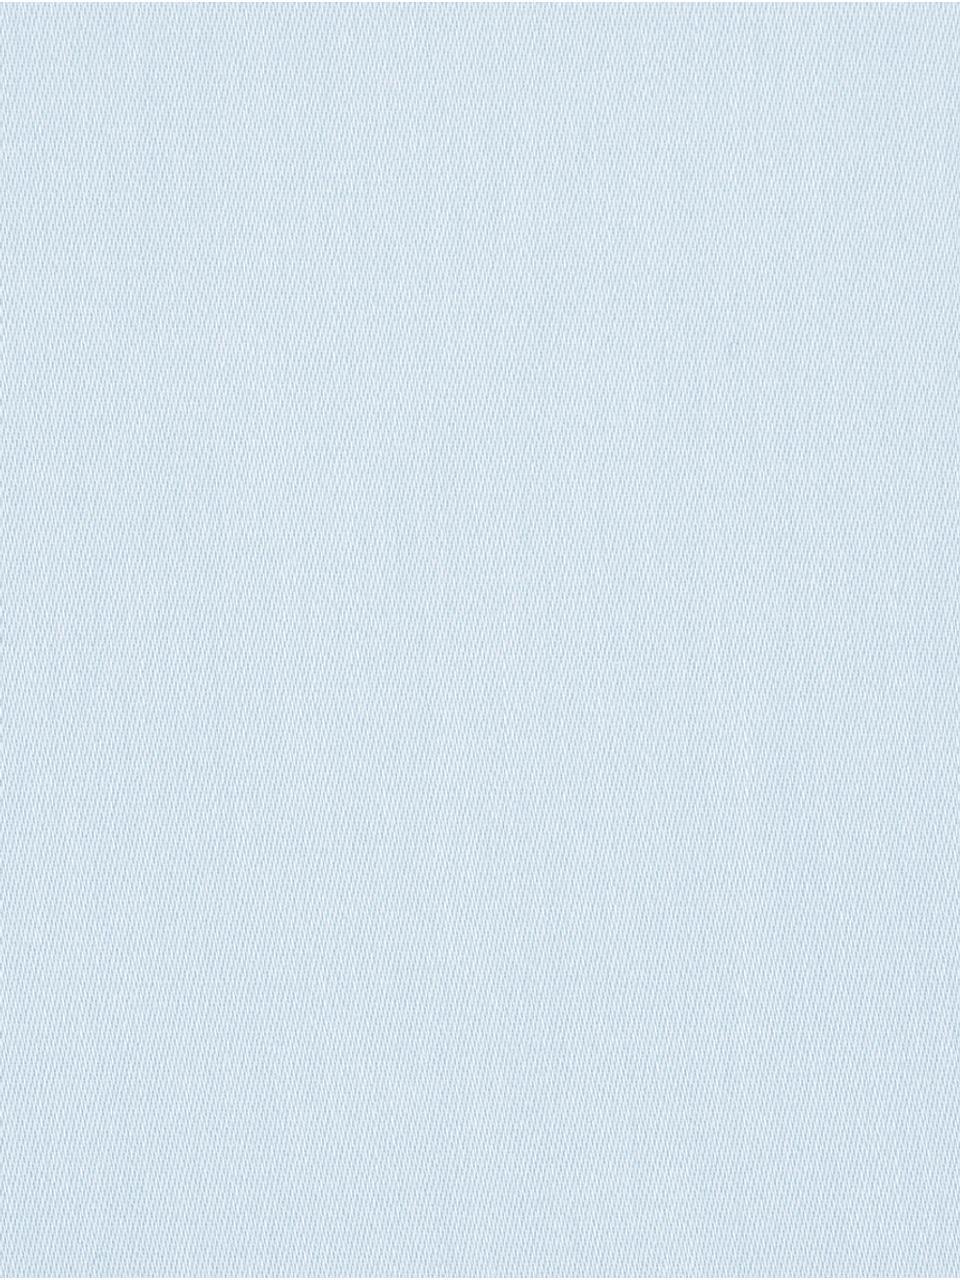 Baumwollsatin-Kissenbezüge Comfort in Hellblau, 2 Stück, Webart: Satin Fadendichte 250 TC,, Hellblau, 40 x 80 cm